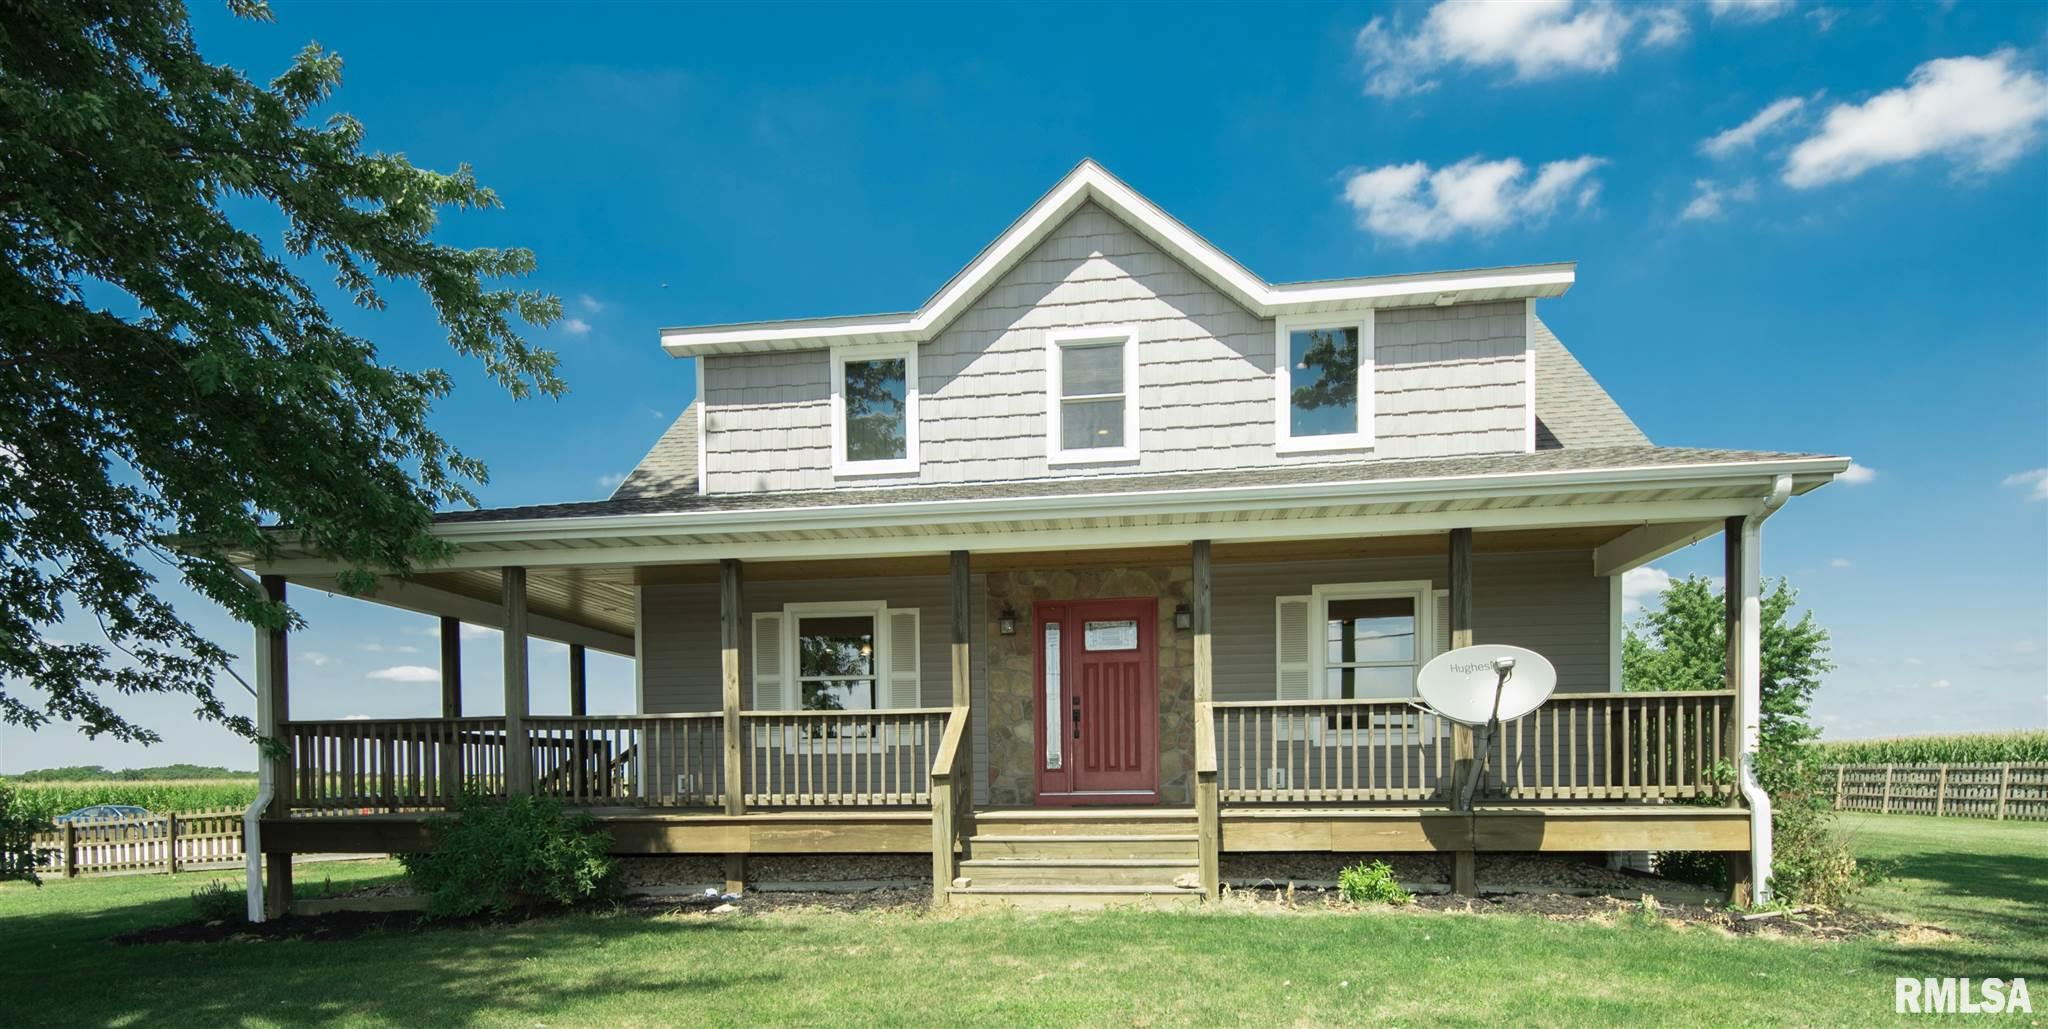 22519 W FARMINGTON Property Photo - Elmwood, IL real estate listing